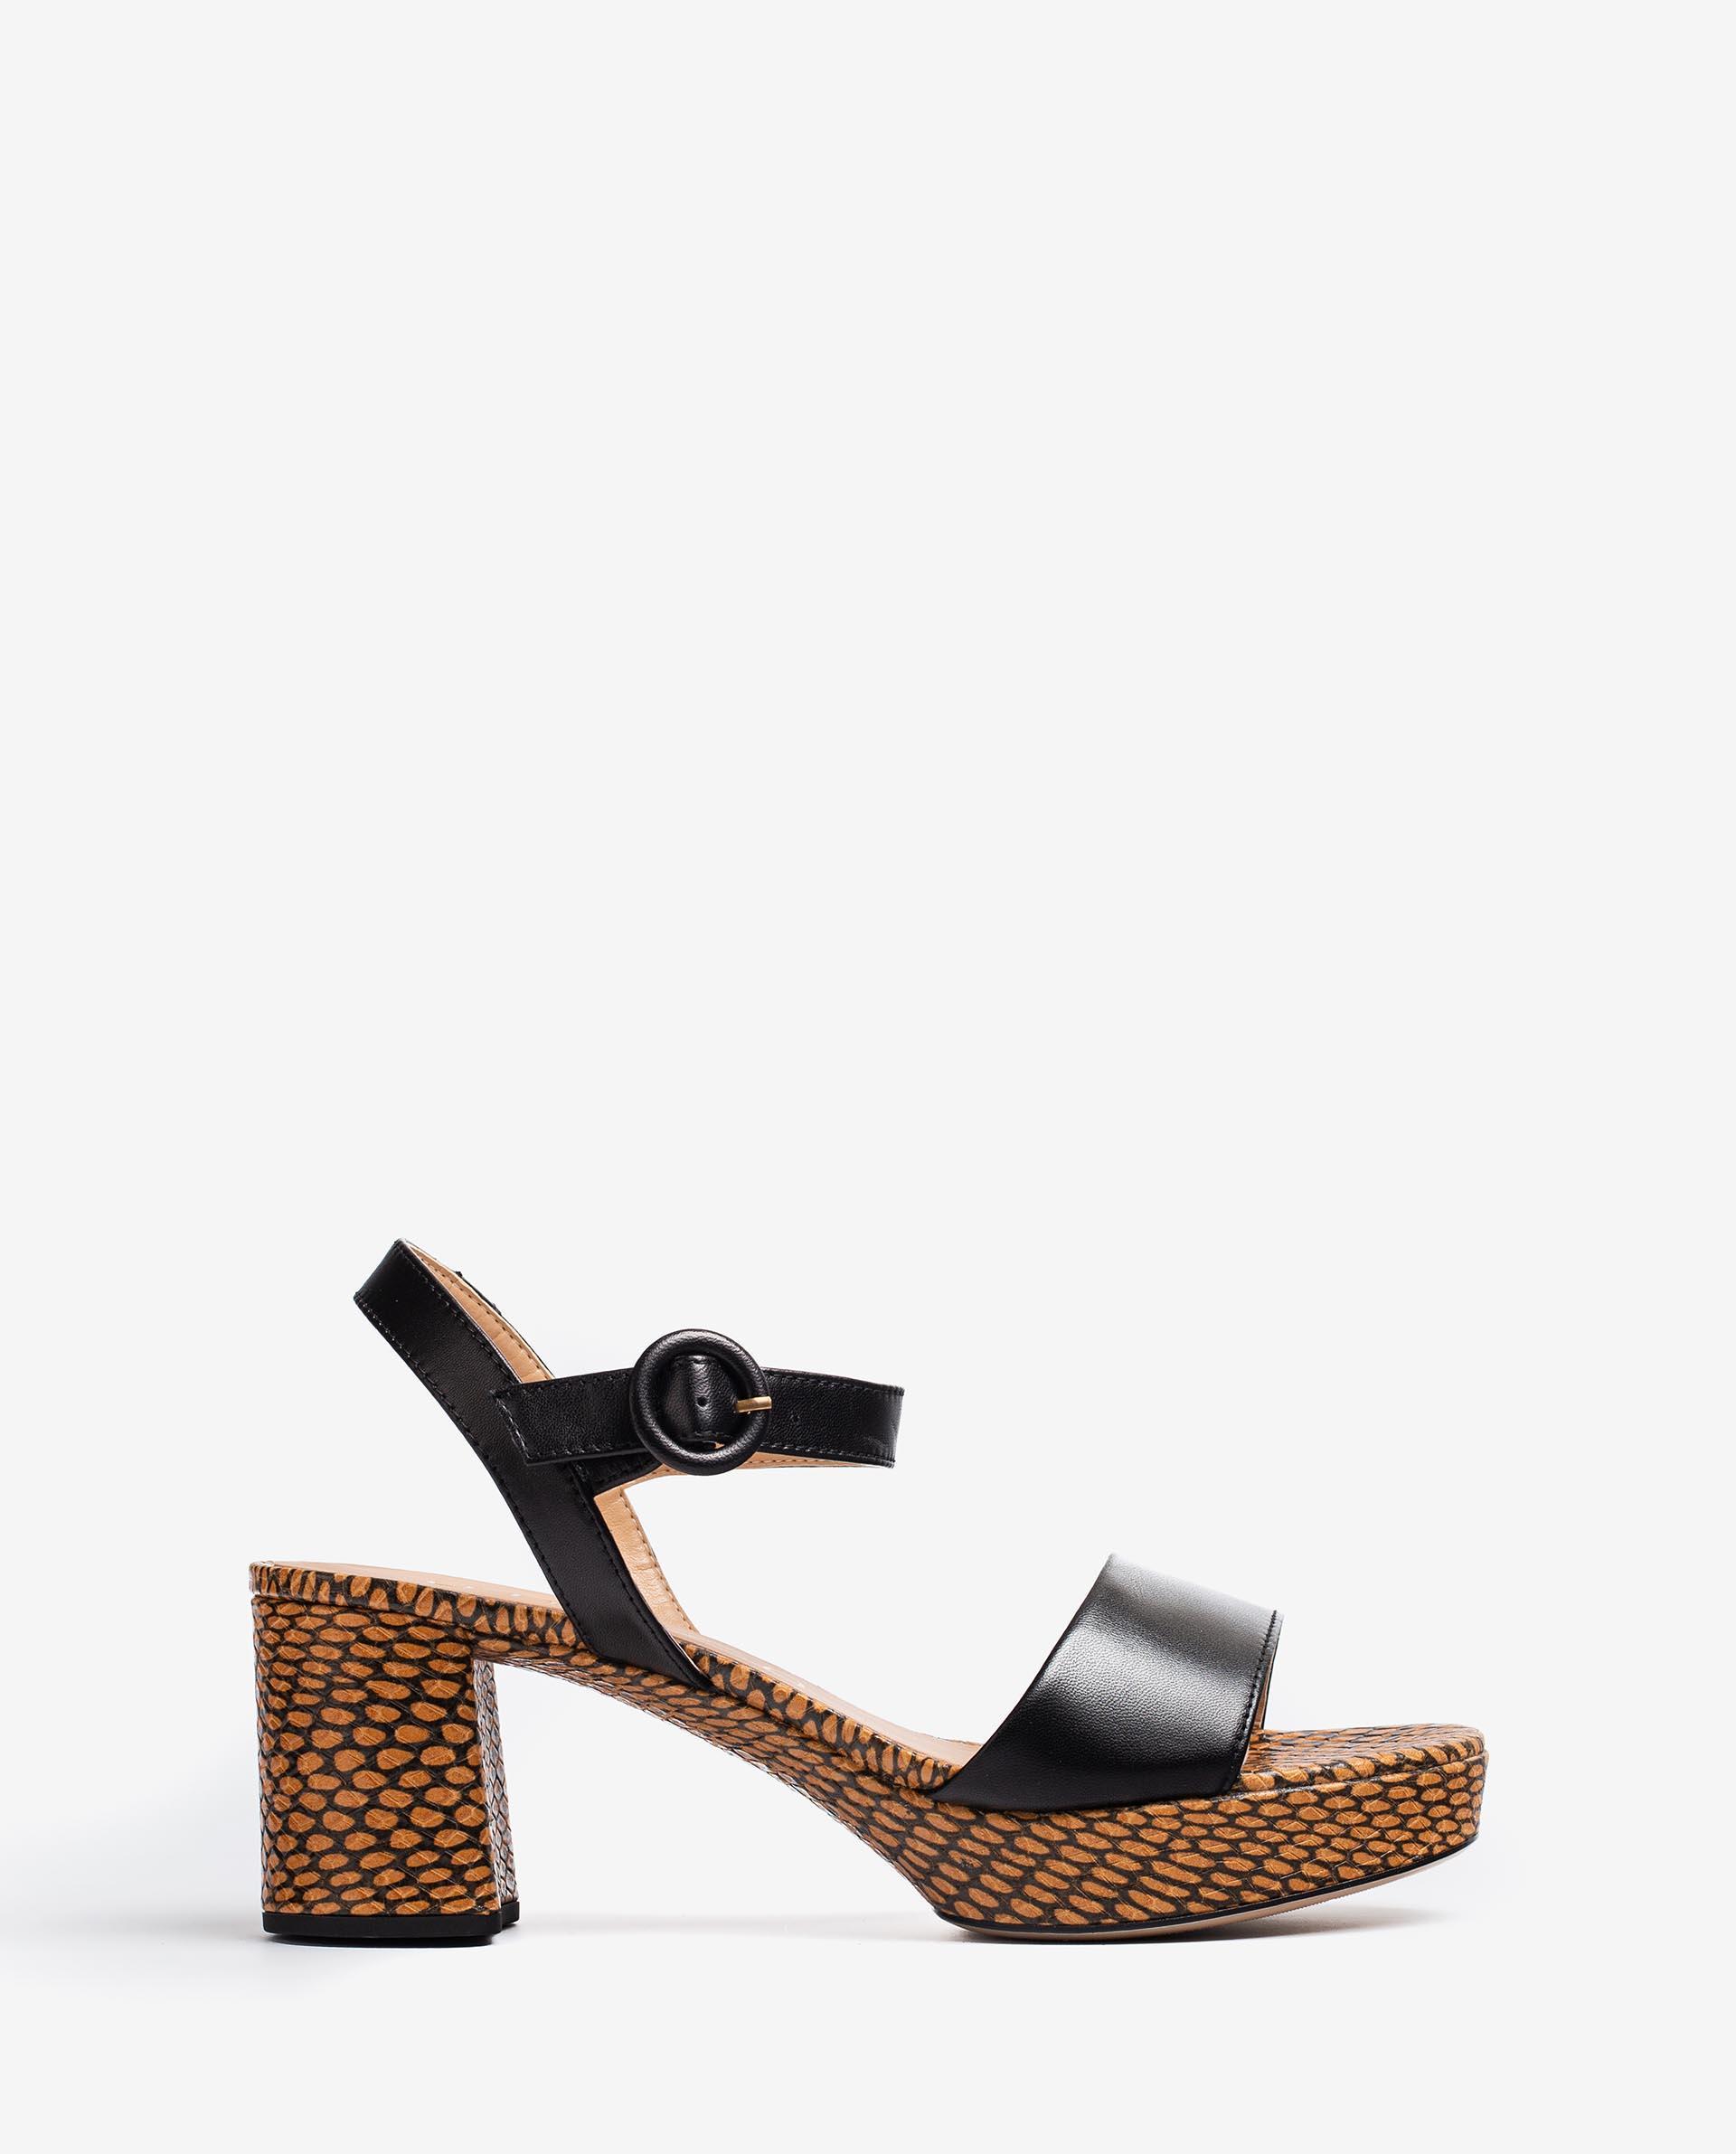 UNISA Snake-Print-Sandalen mit breitem Absatz NENES_21_NA_MA 5